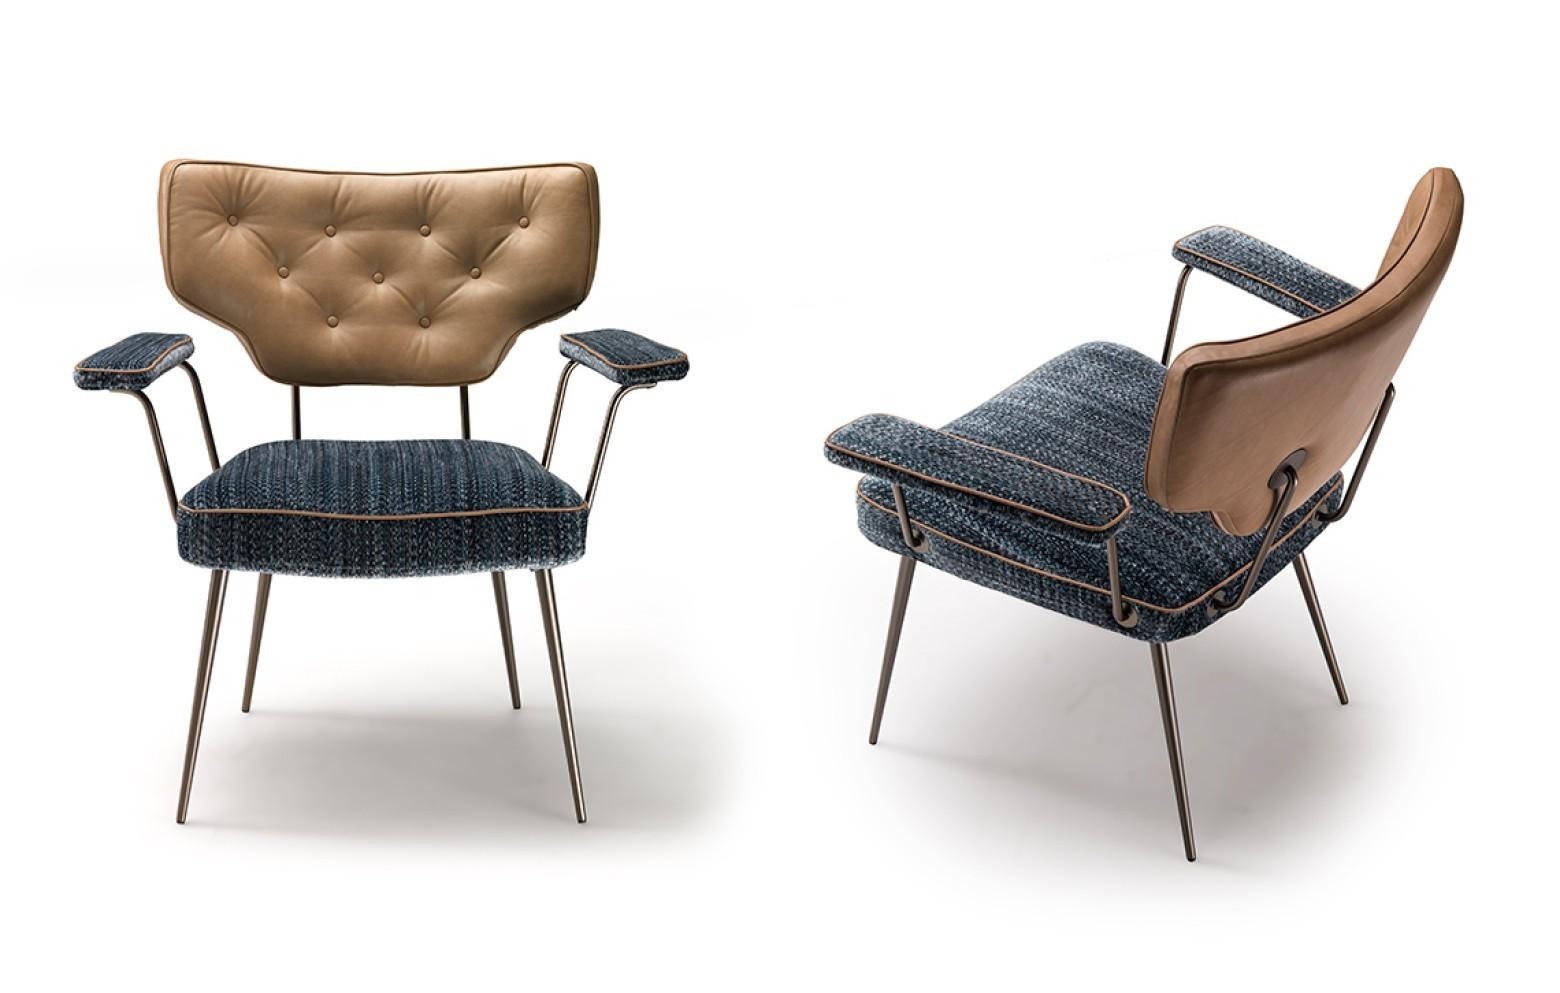 twiggy sessel sessel liegen polsterm bel who 39 s perfect. Black Bedroom Furniture Sets. Home Design Ideas